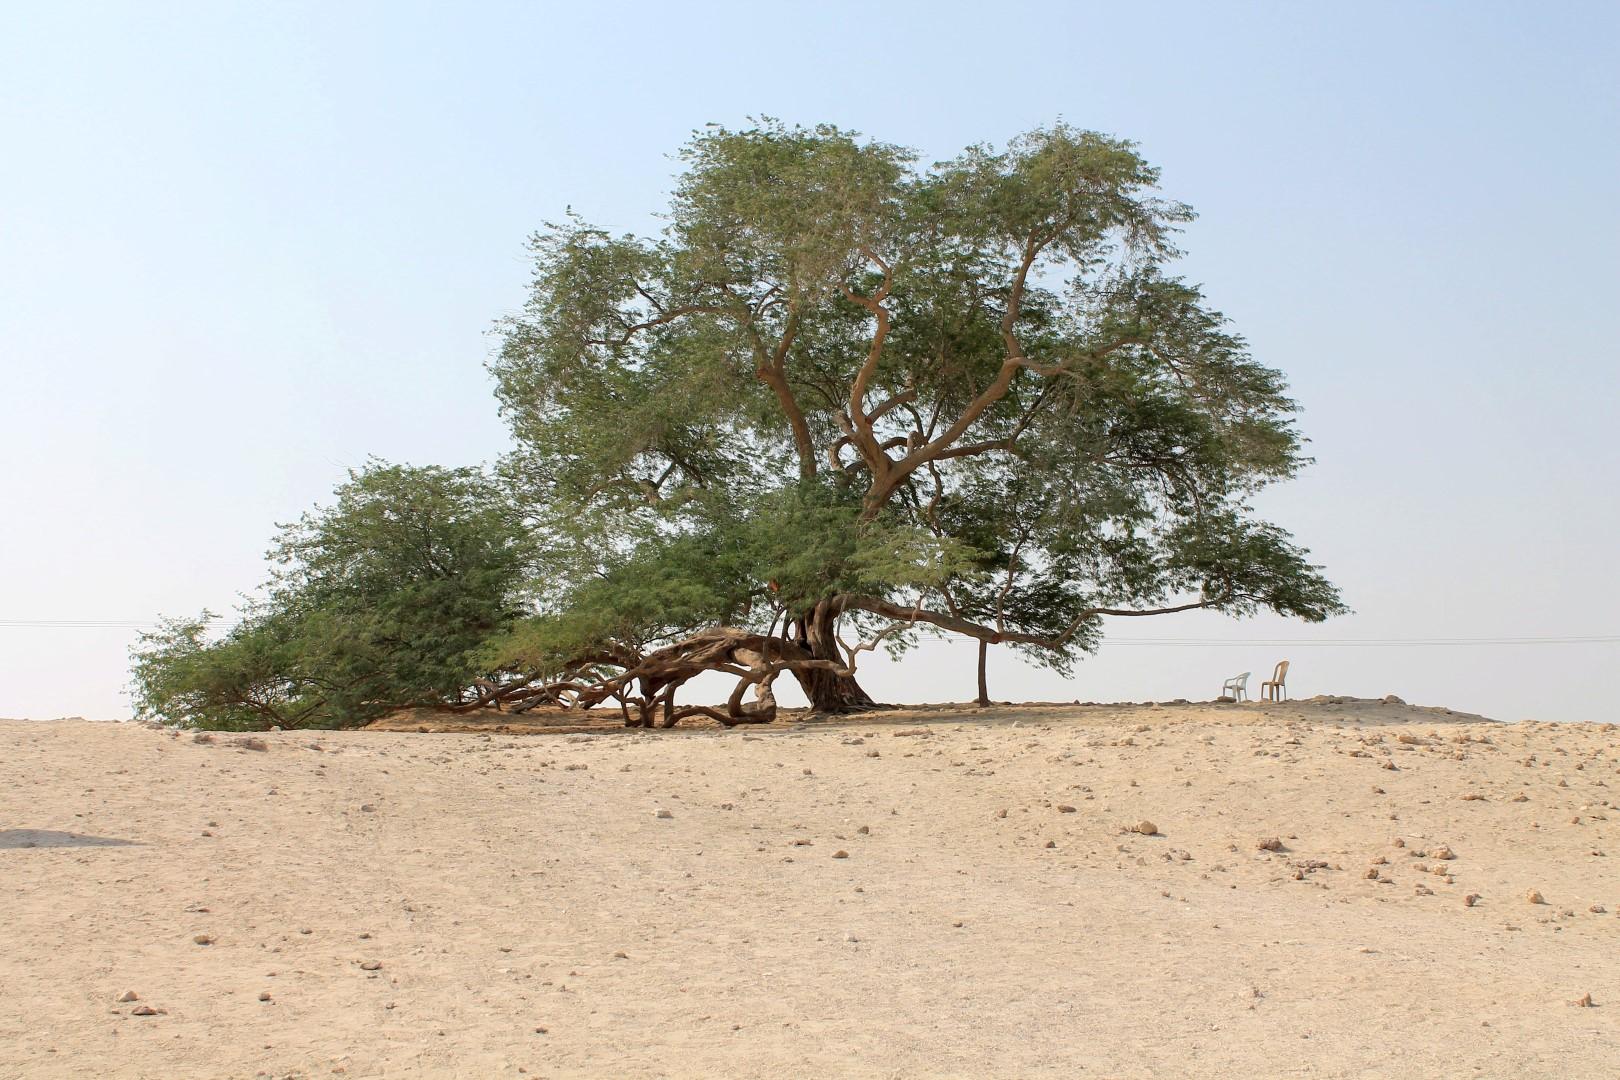 tree_of_life_bahrain.jpg